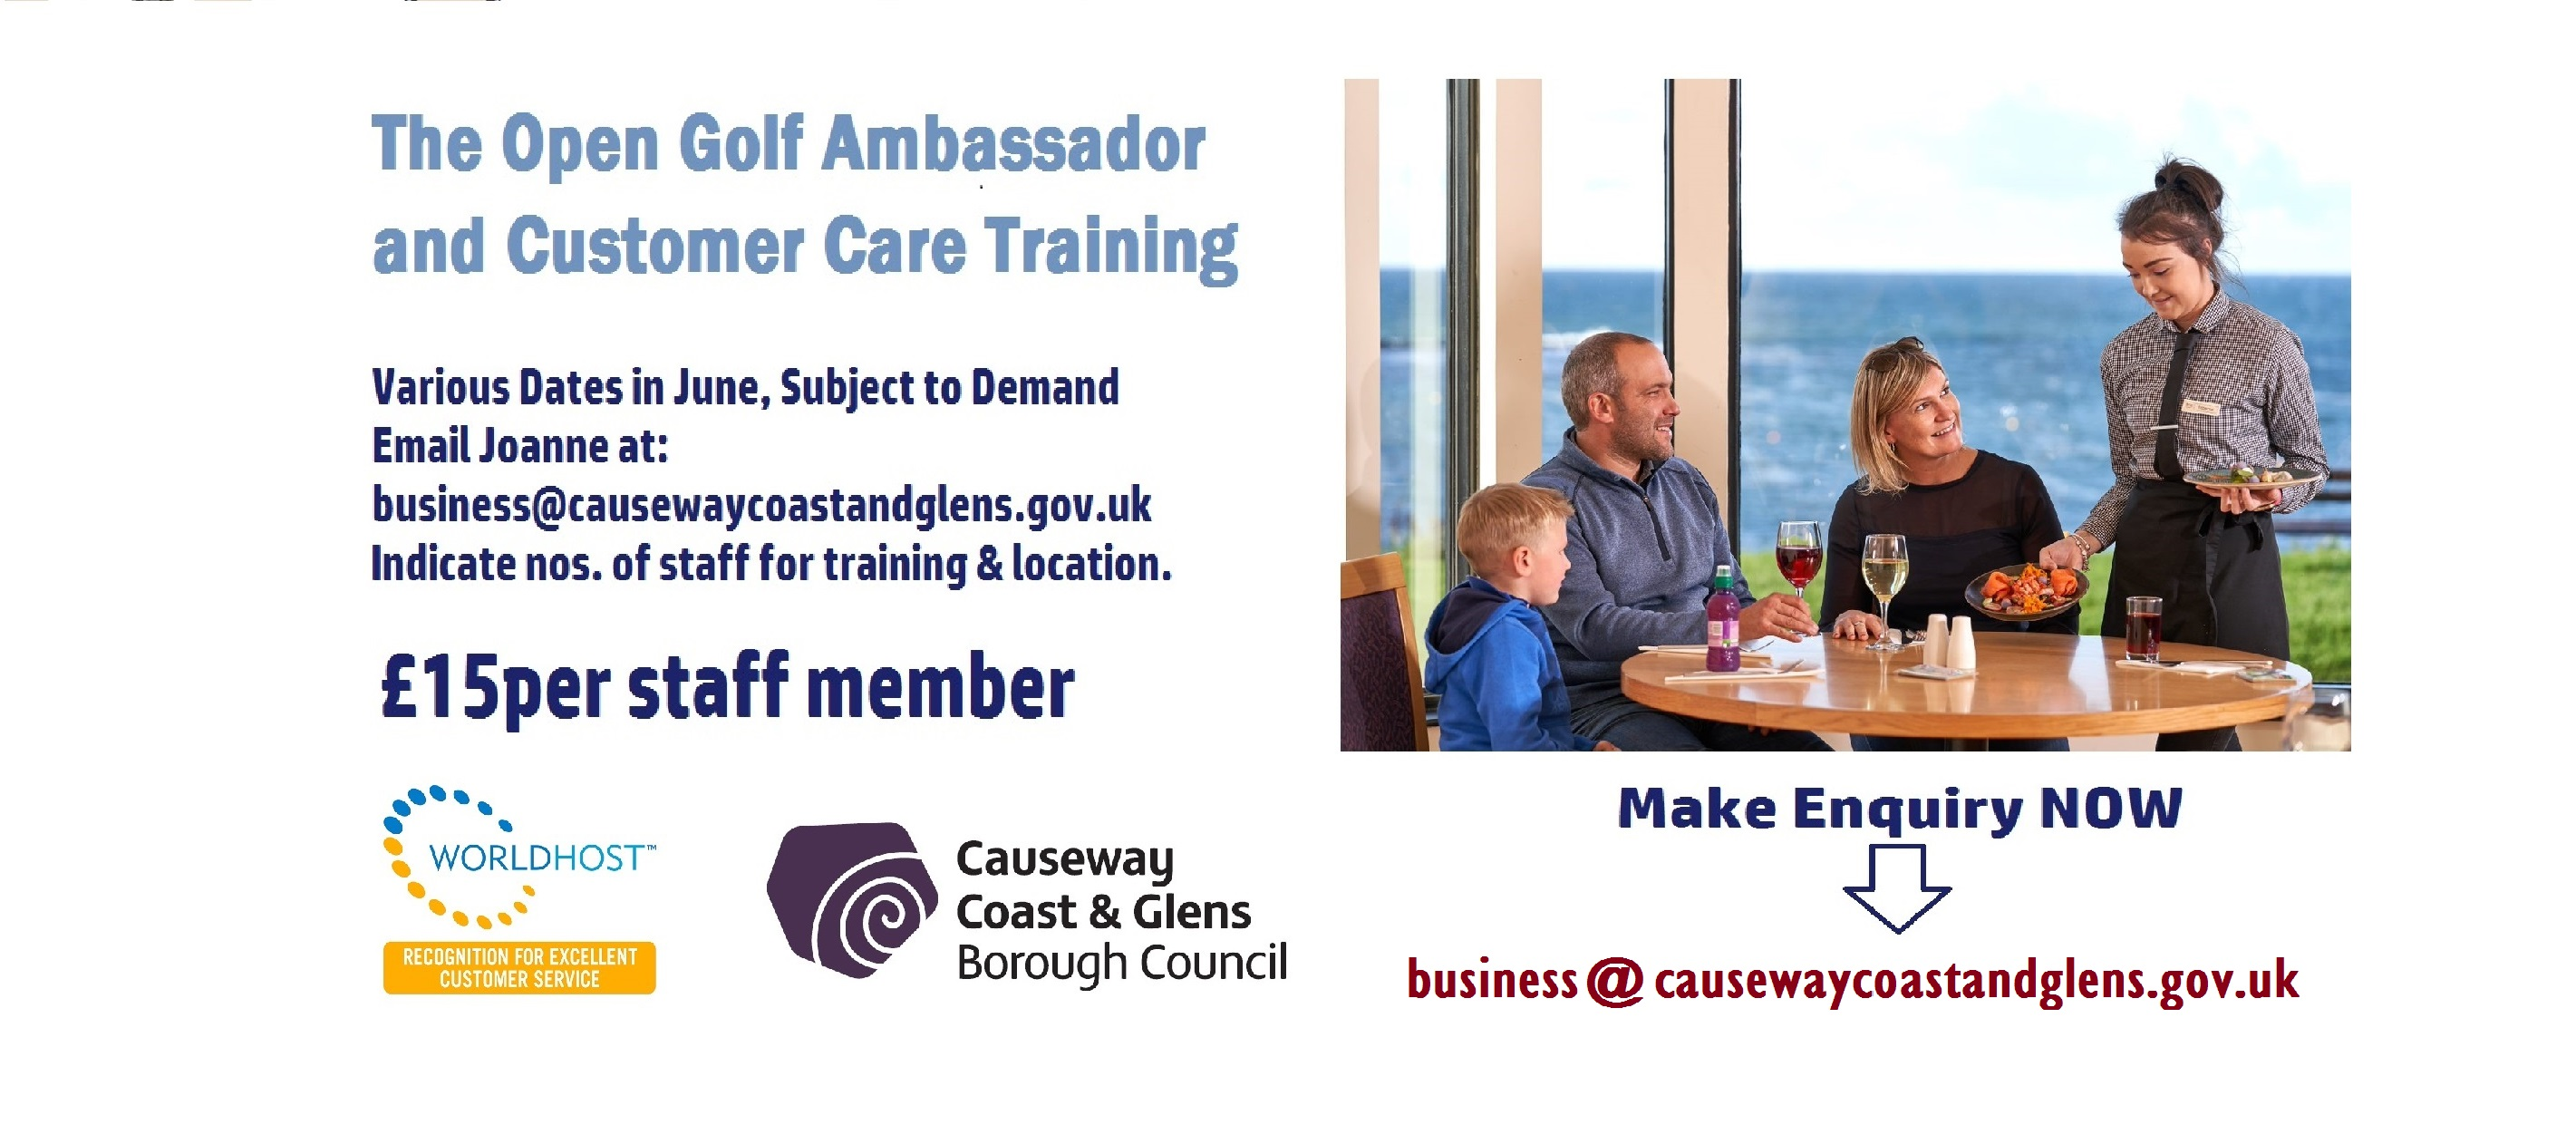 Golf Ambassador and Customer Care Training.  Email business@causewaycoastandglens.gov.uk to express interest